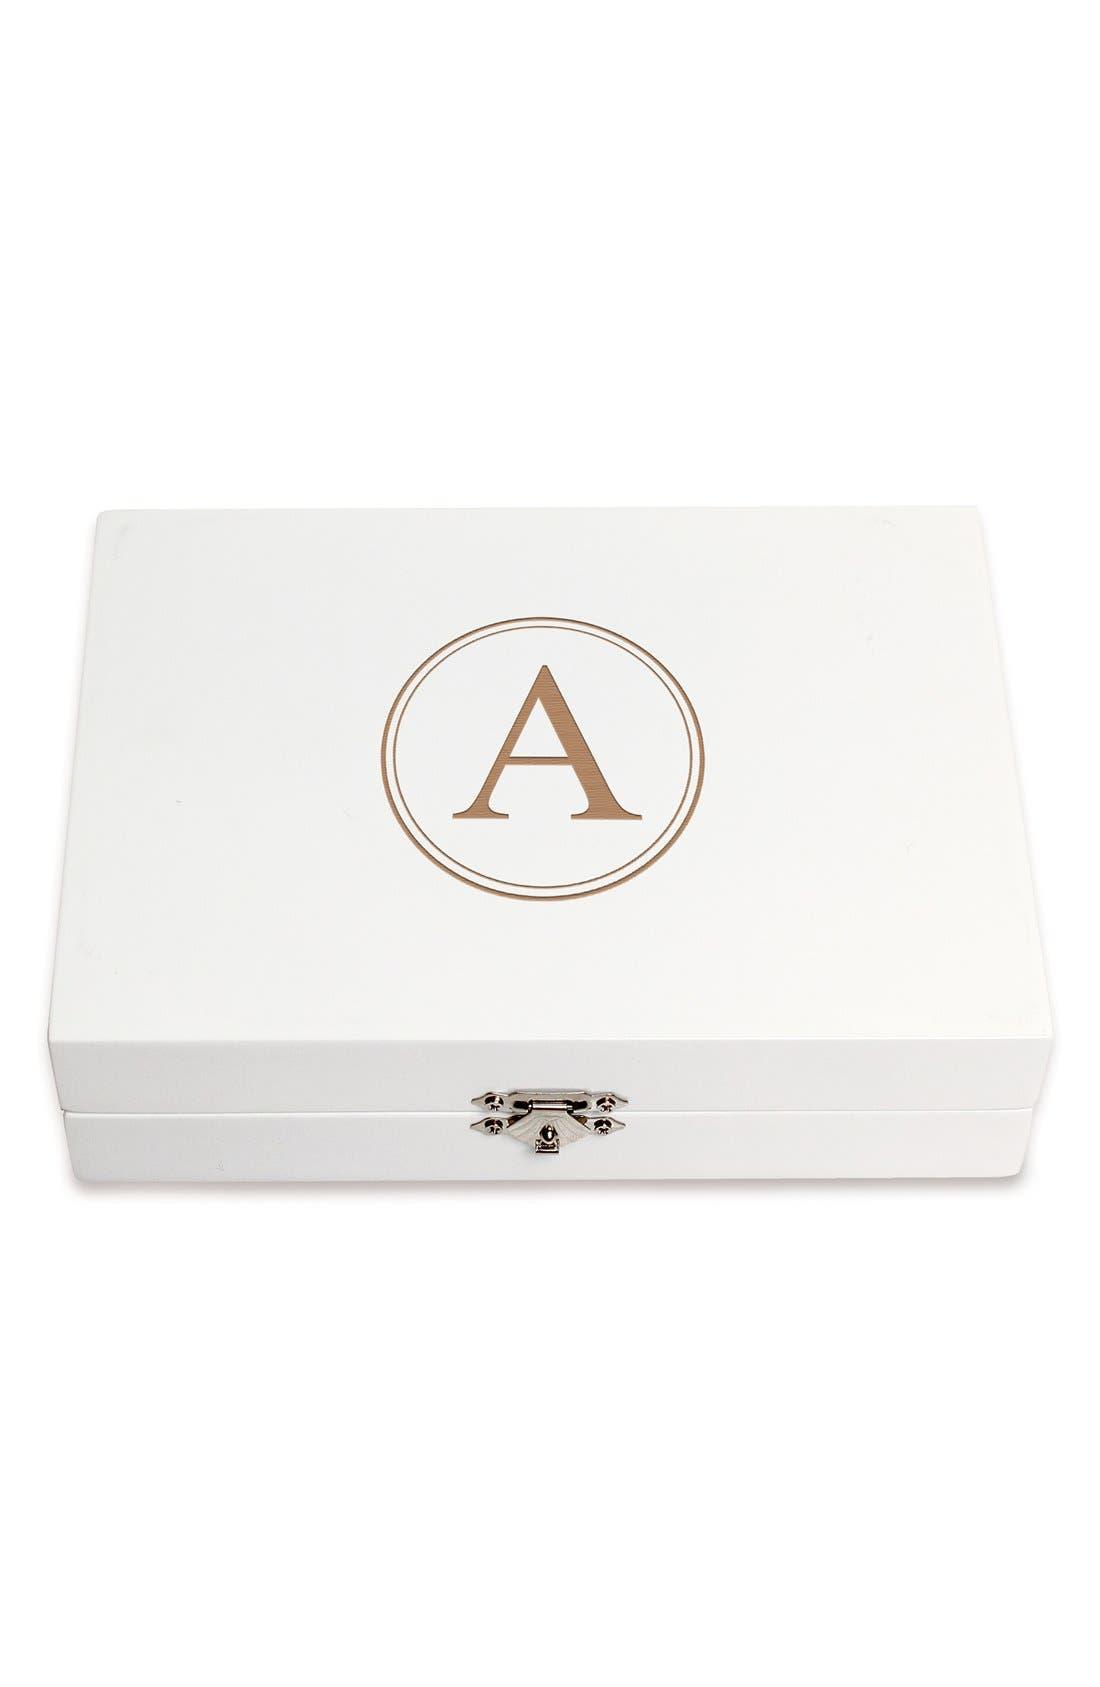 Cathy's Concepts Monogram Wooden Jewelry Box